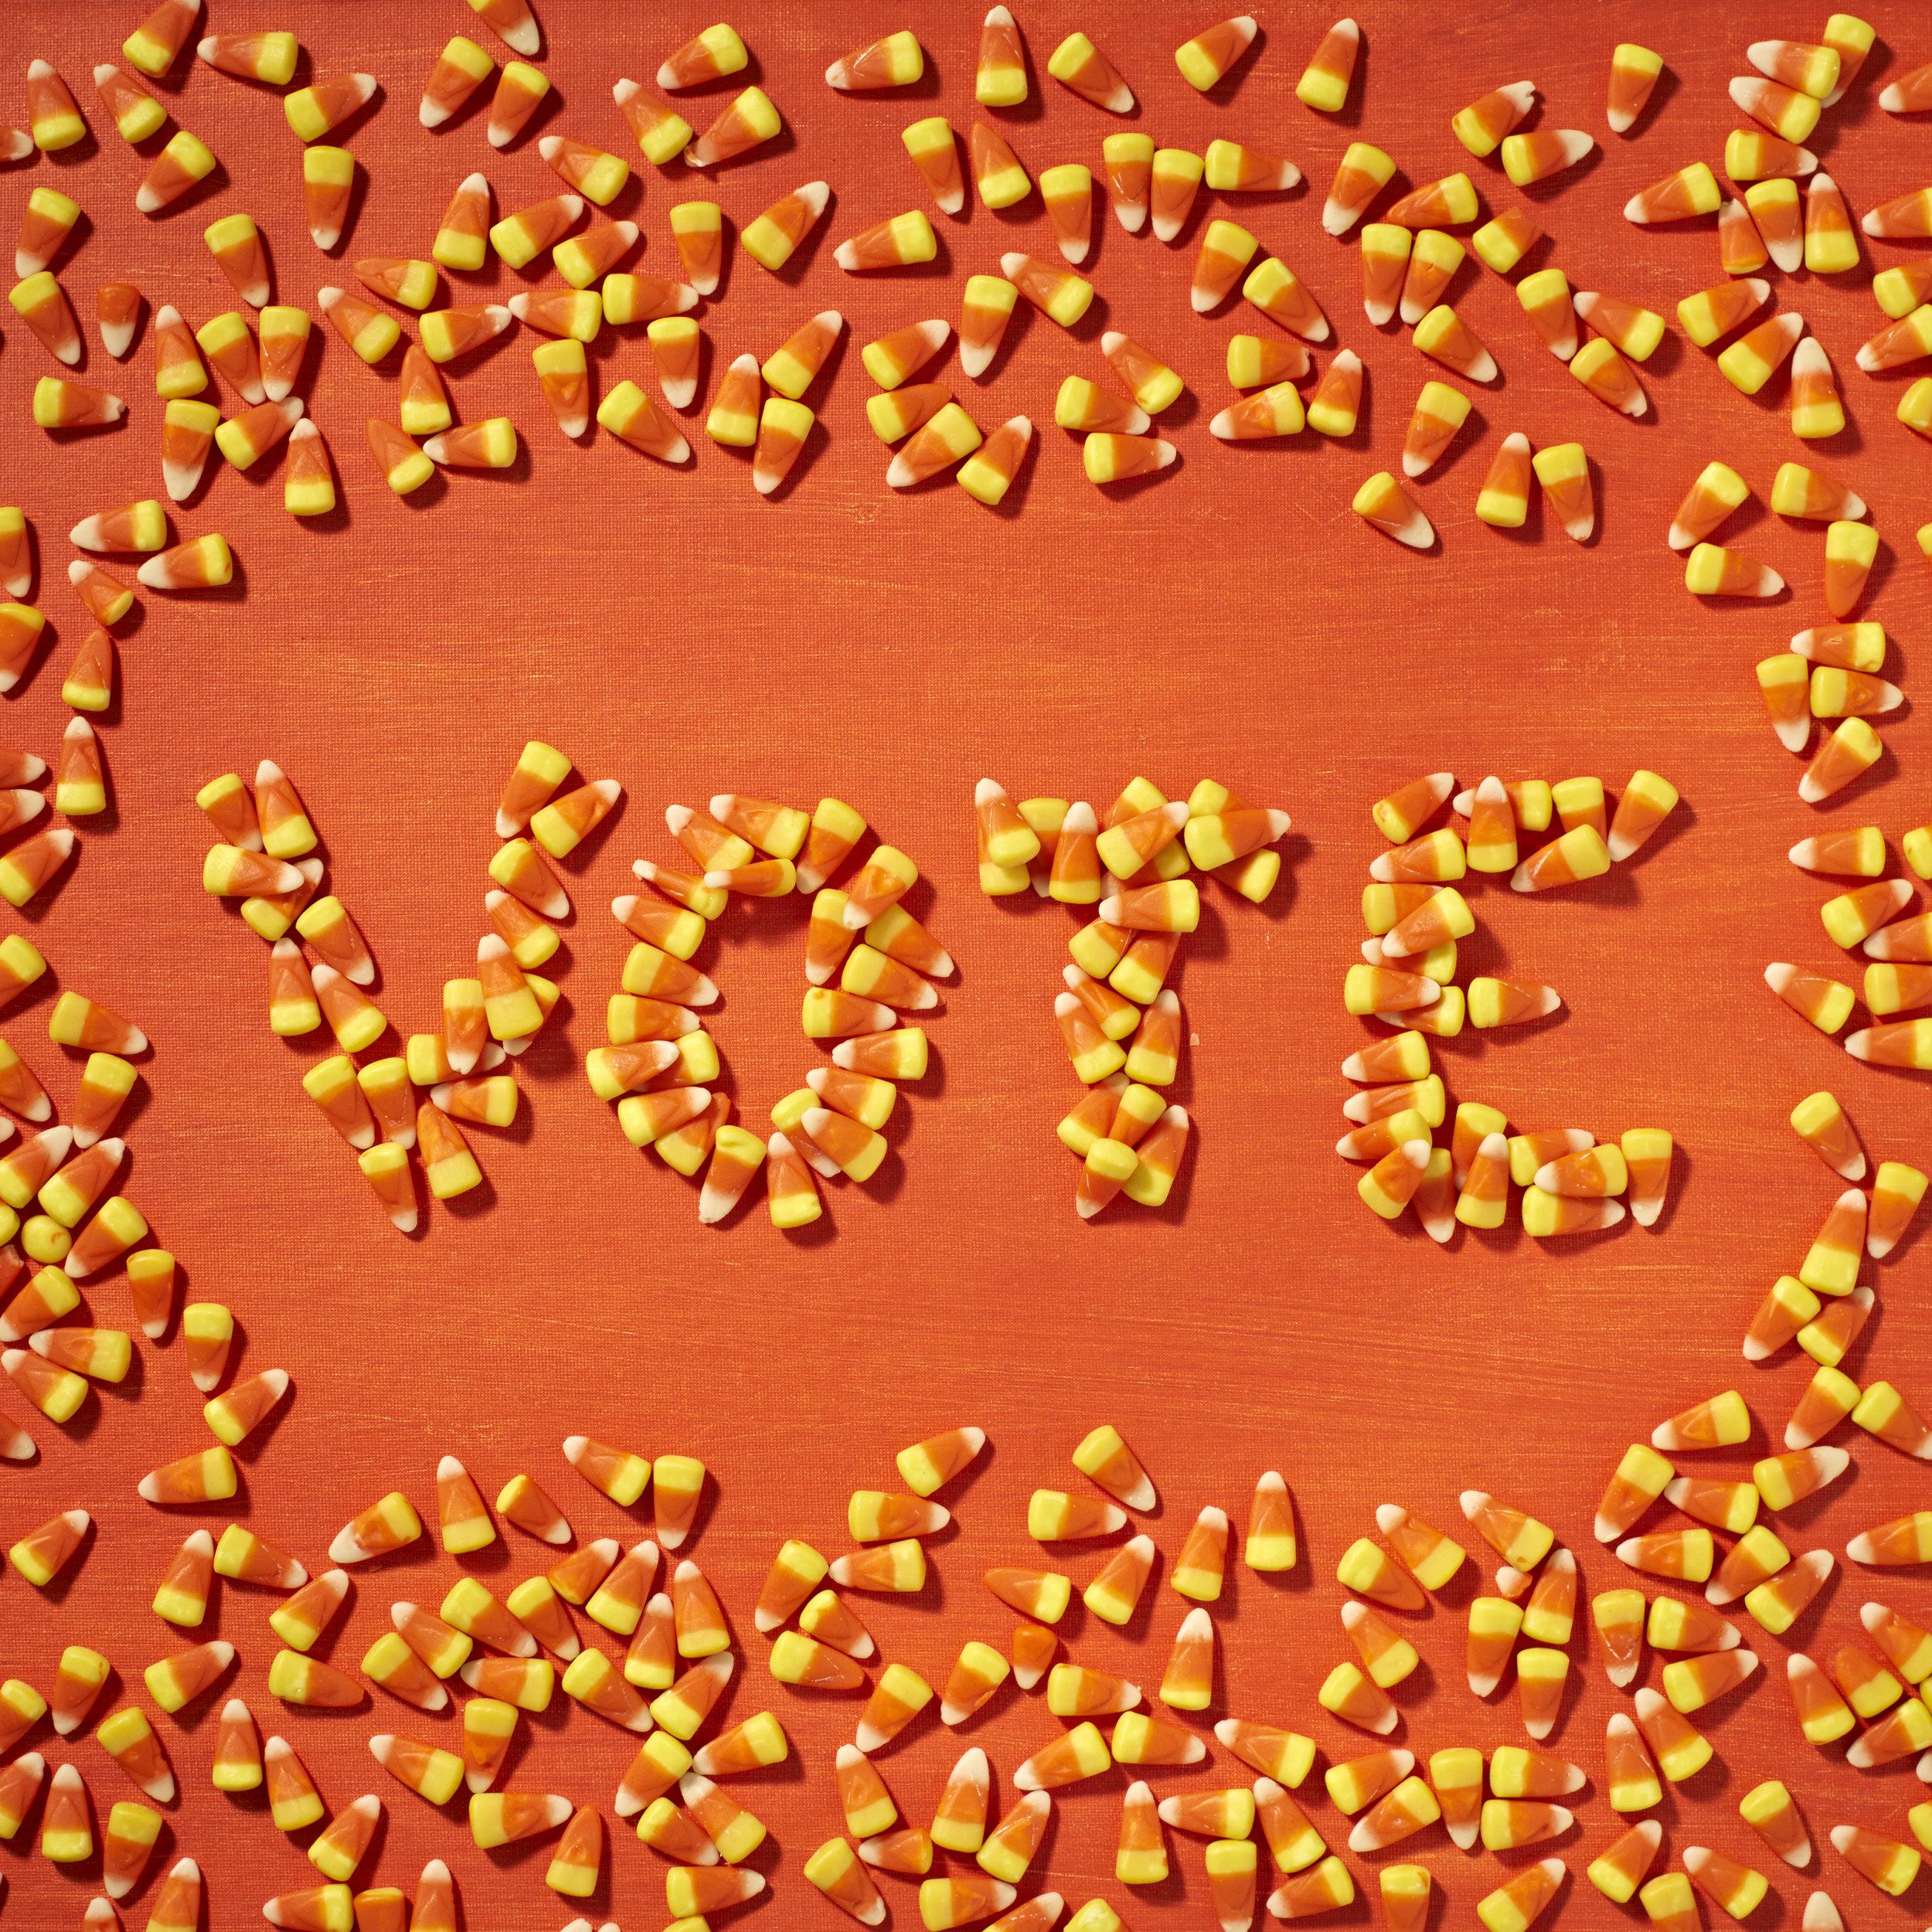 Vote_Candy Corn.jpg